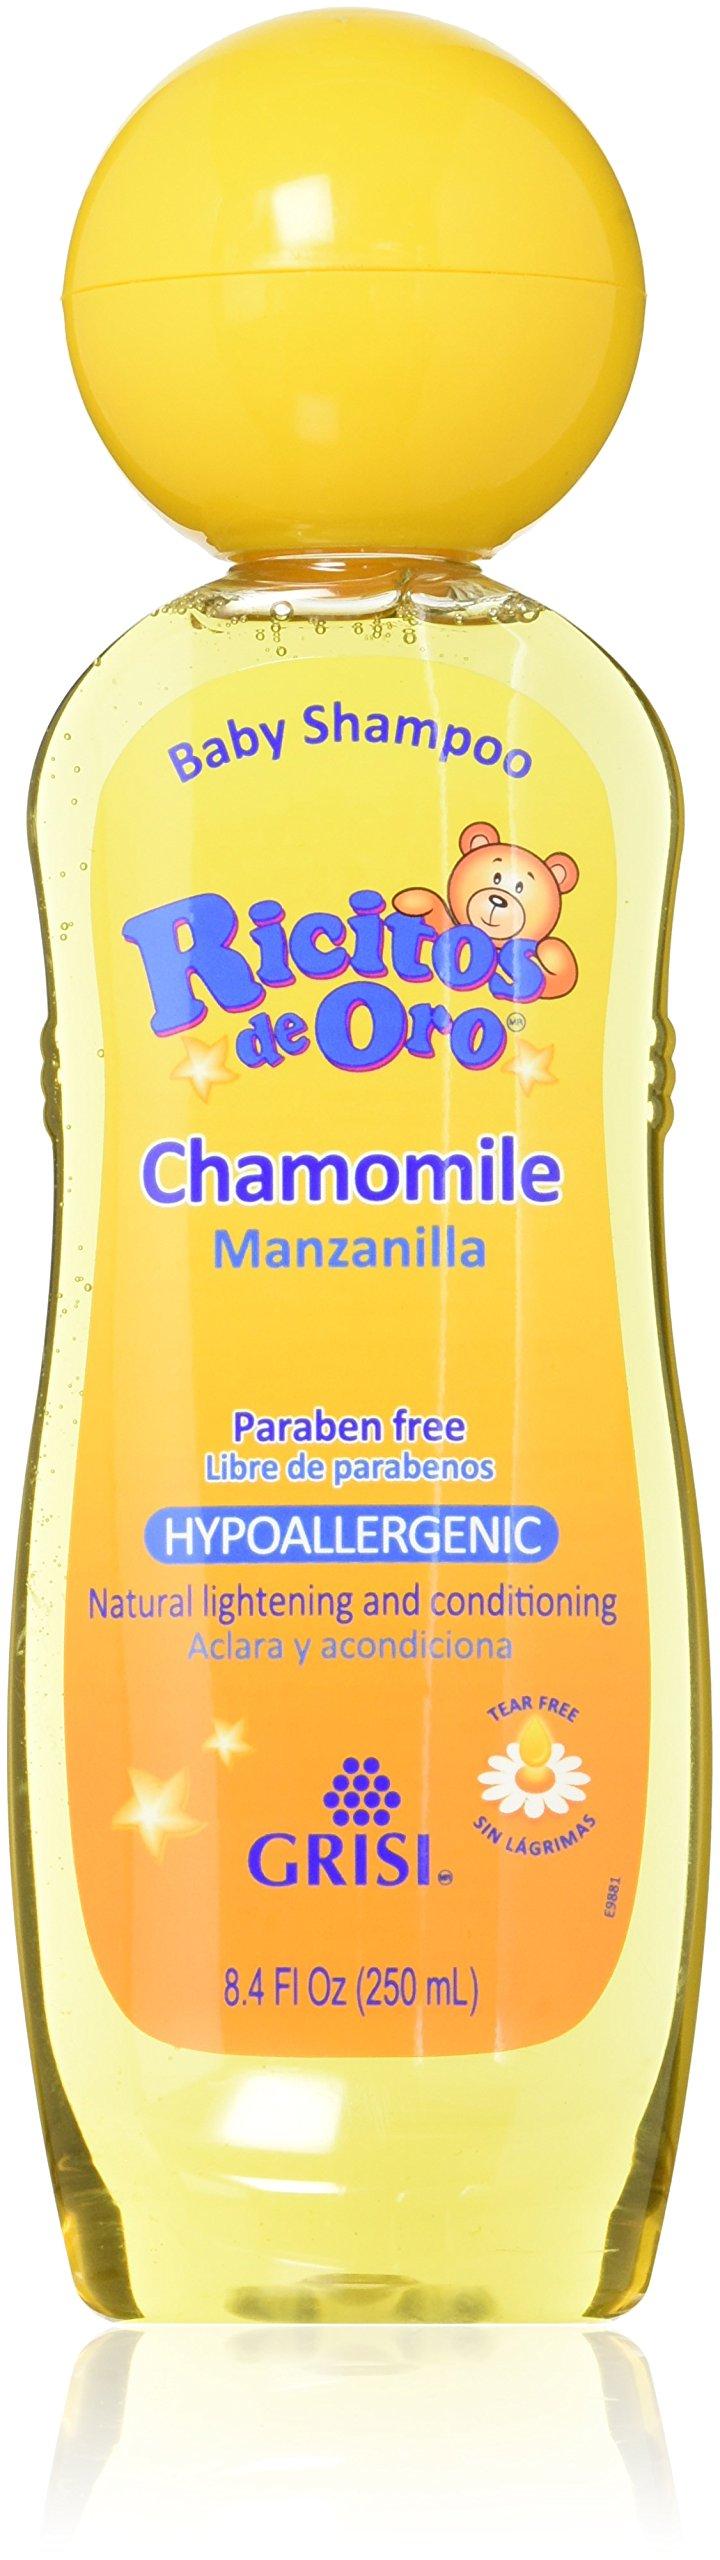 Set of 3 Ricitos de Oro Baby Shampoo Chamomile Hypoallergenic Tear Free Shampoo